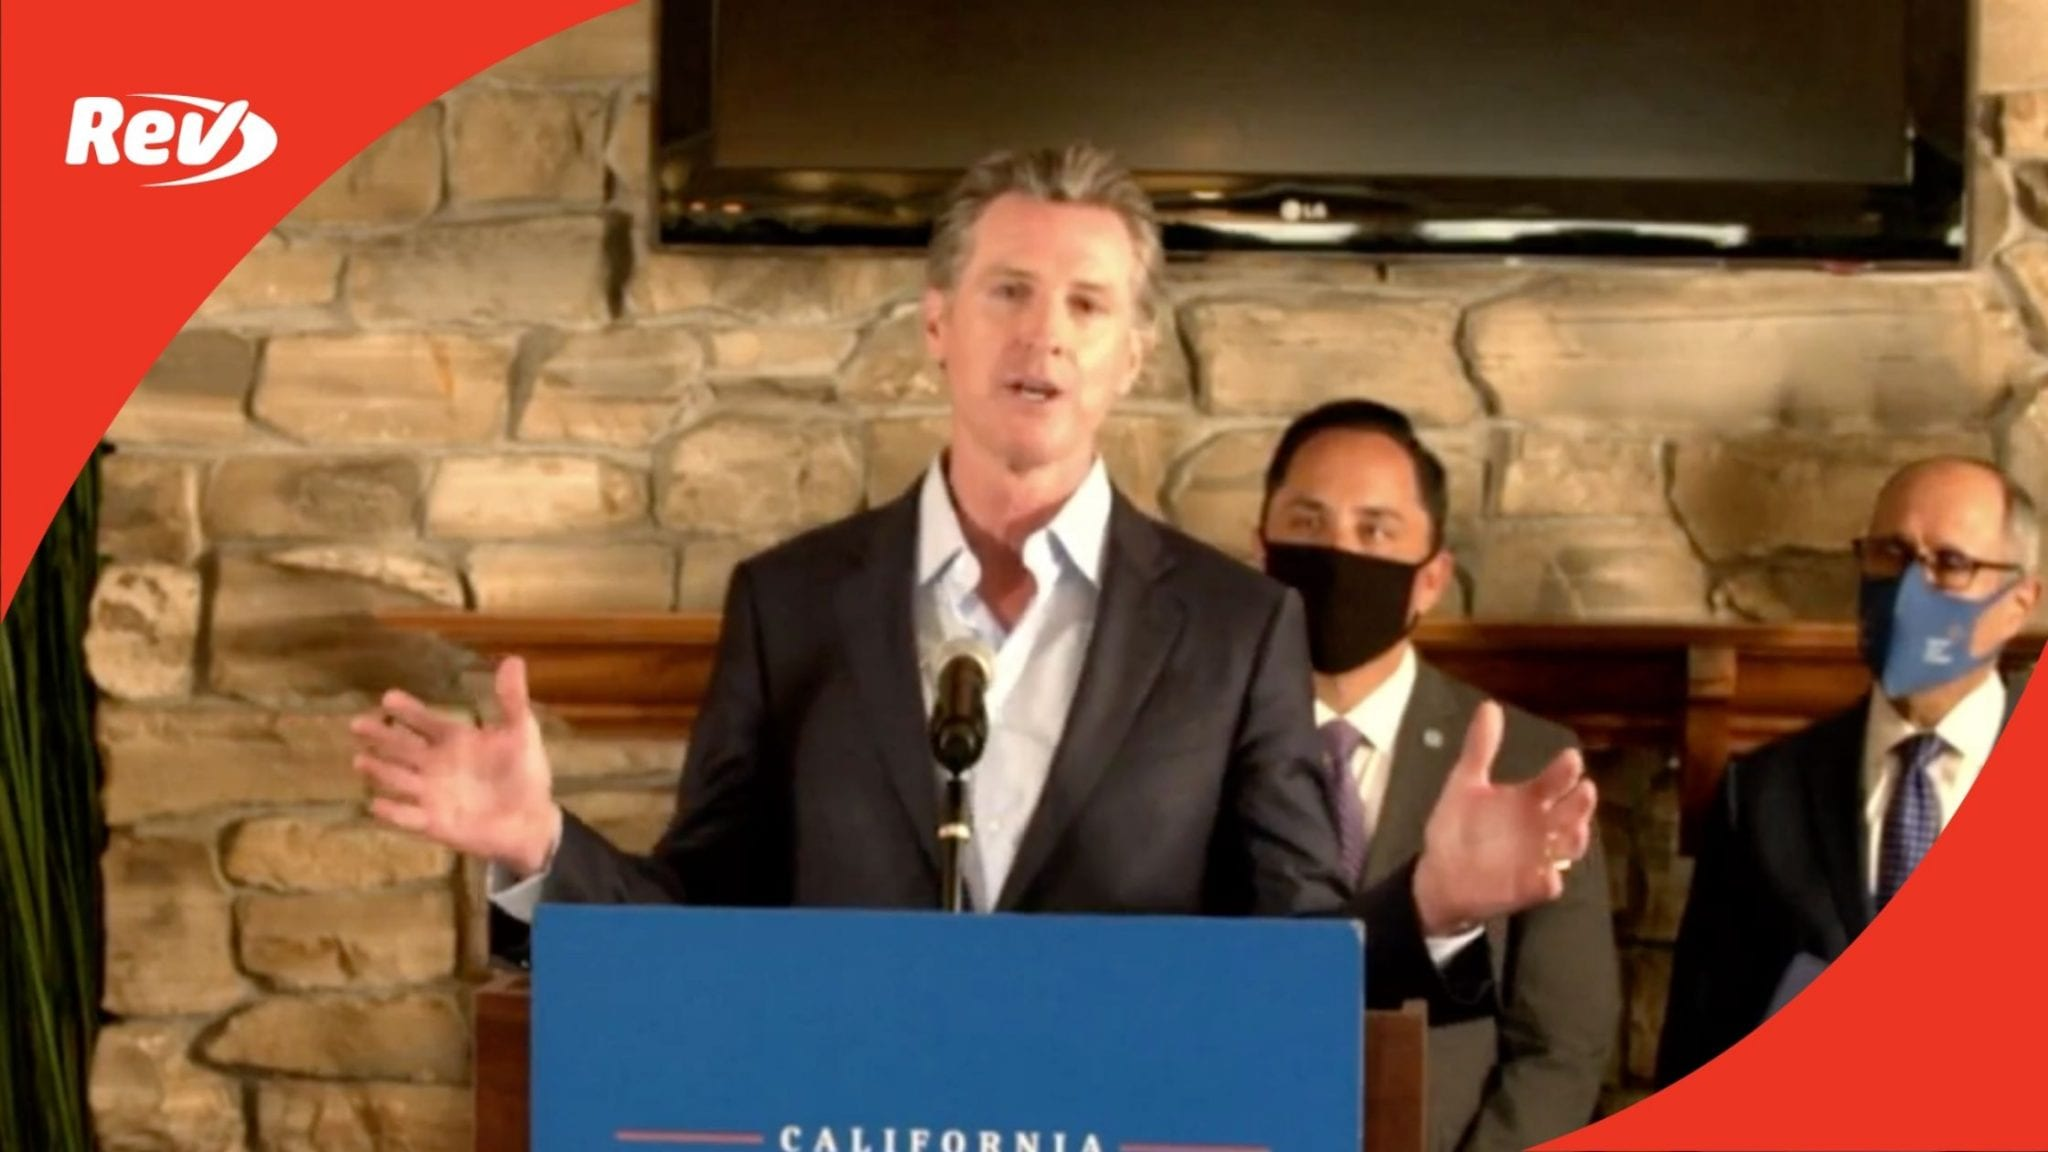 California Gov. Gavin Newsom Homelessness Crisis Response Press Conference Transcript May 11